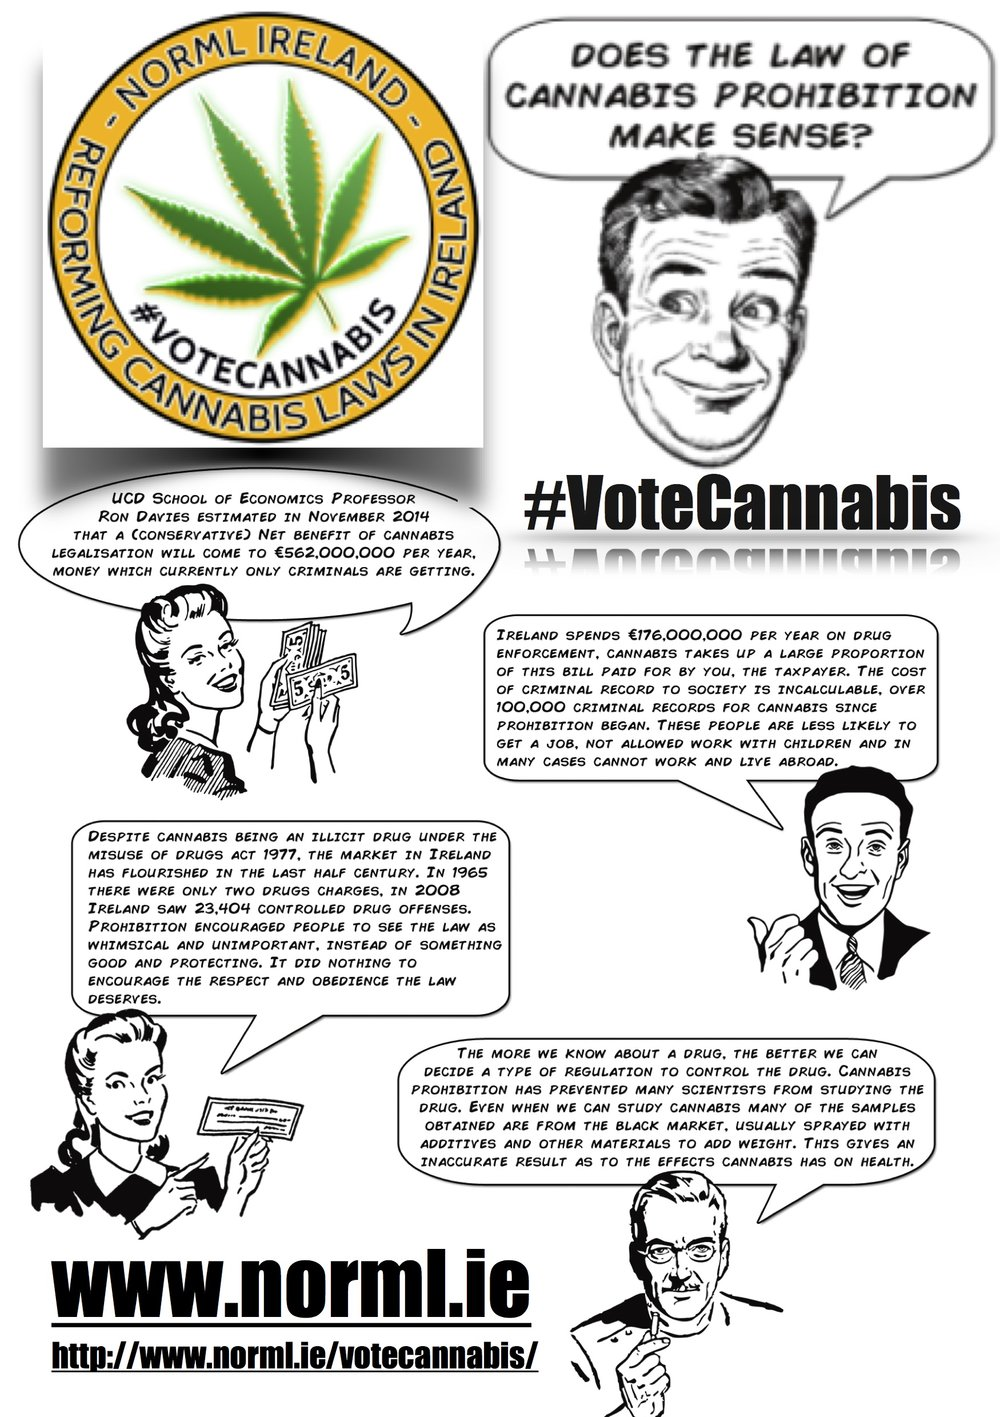 Norml Ireland #votecannabis flyer A5 2018 P1.jpg